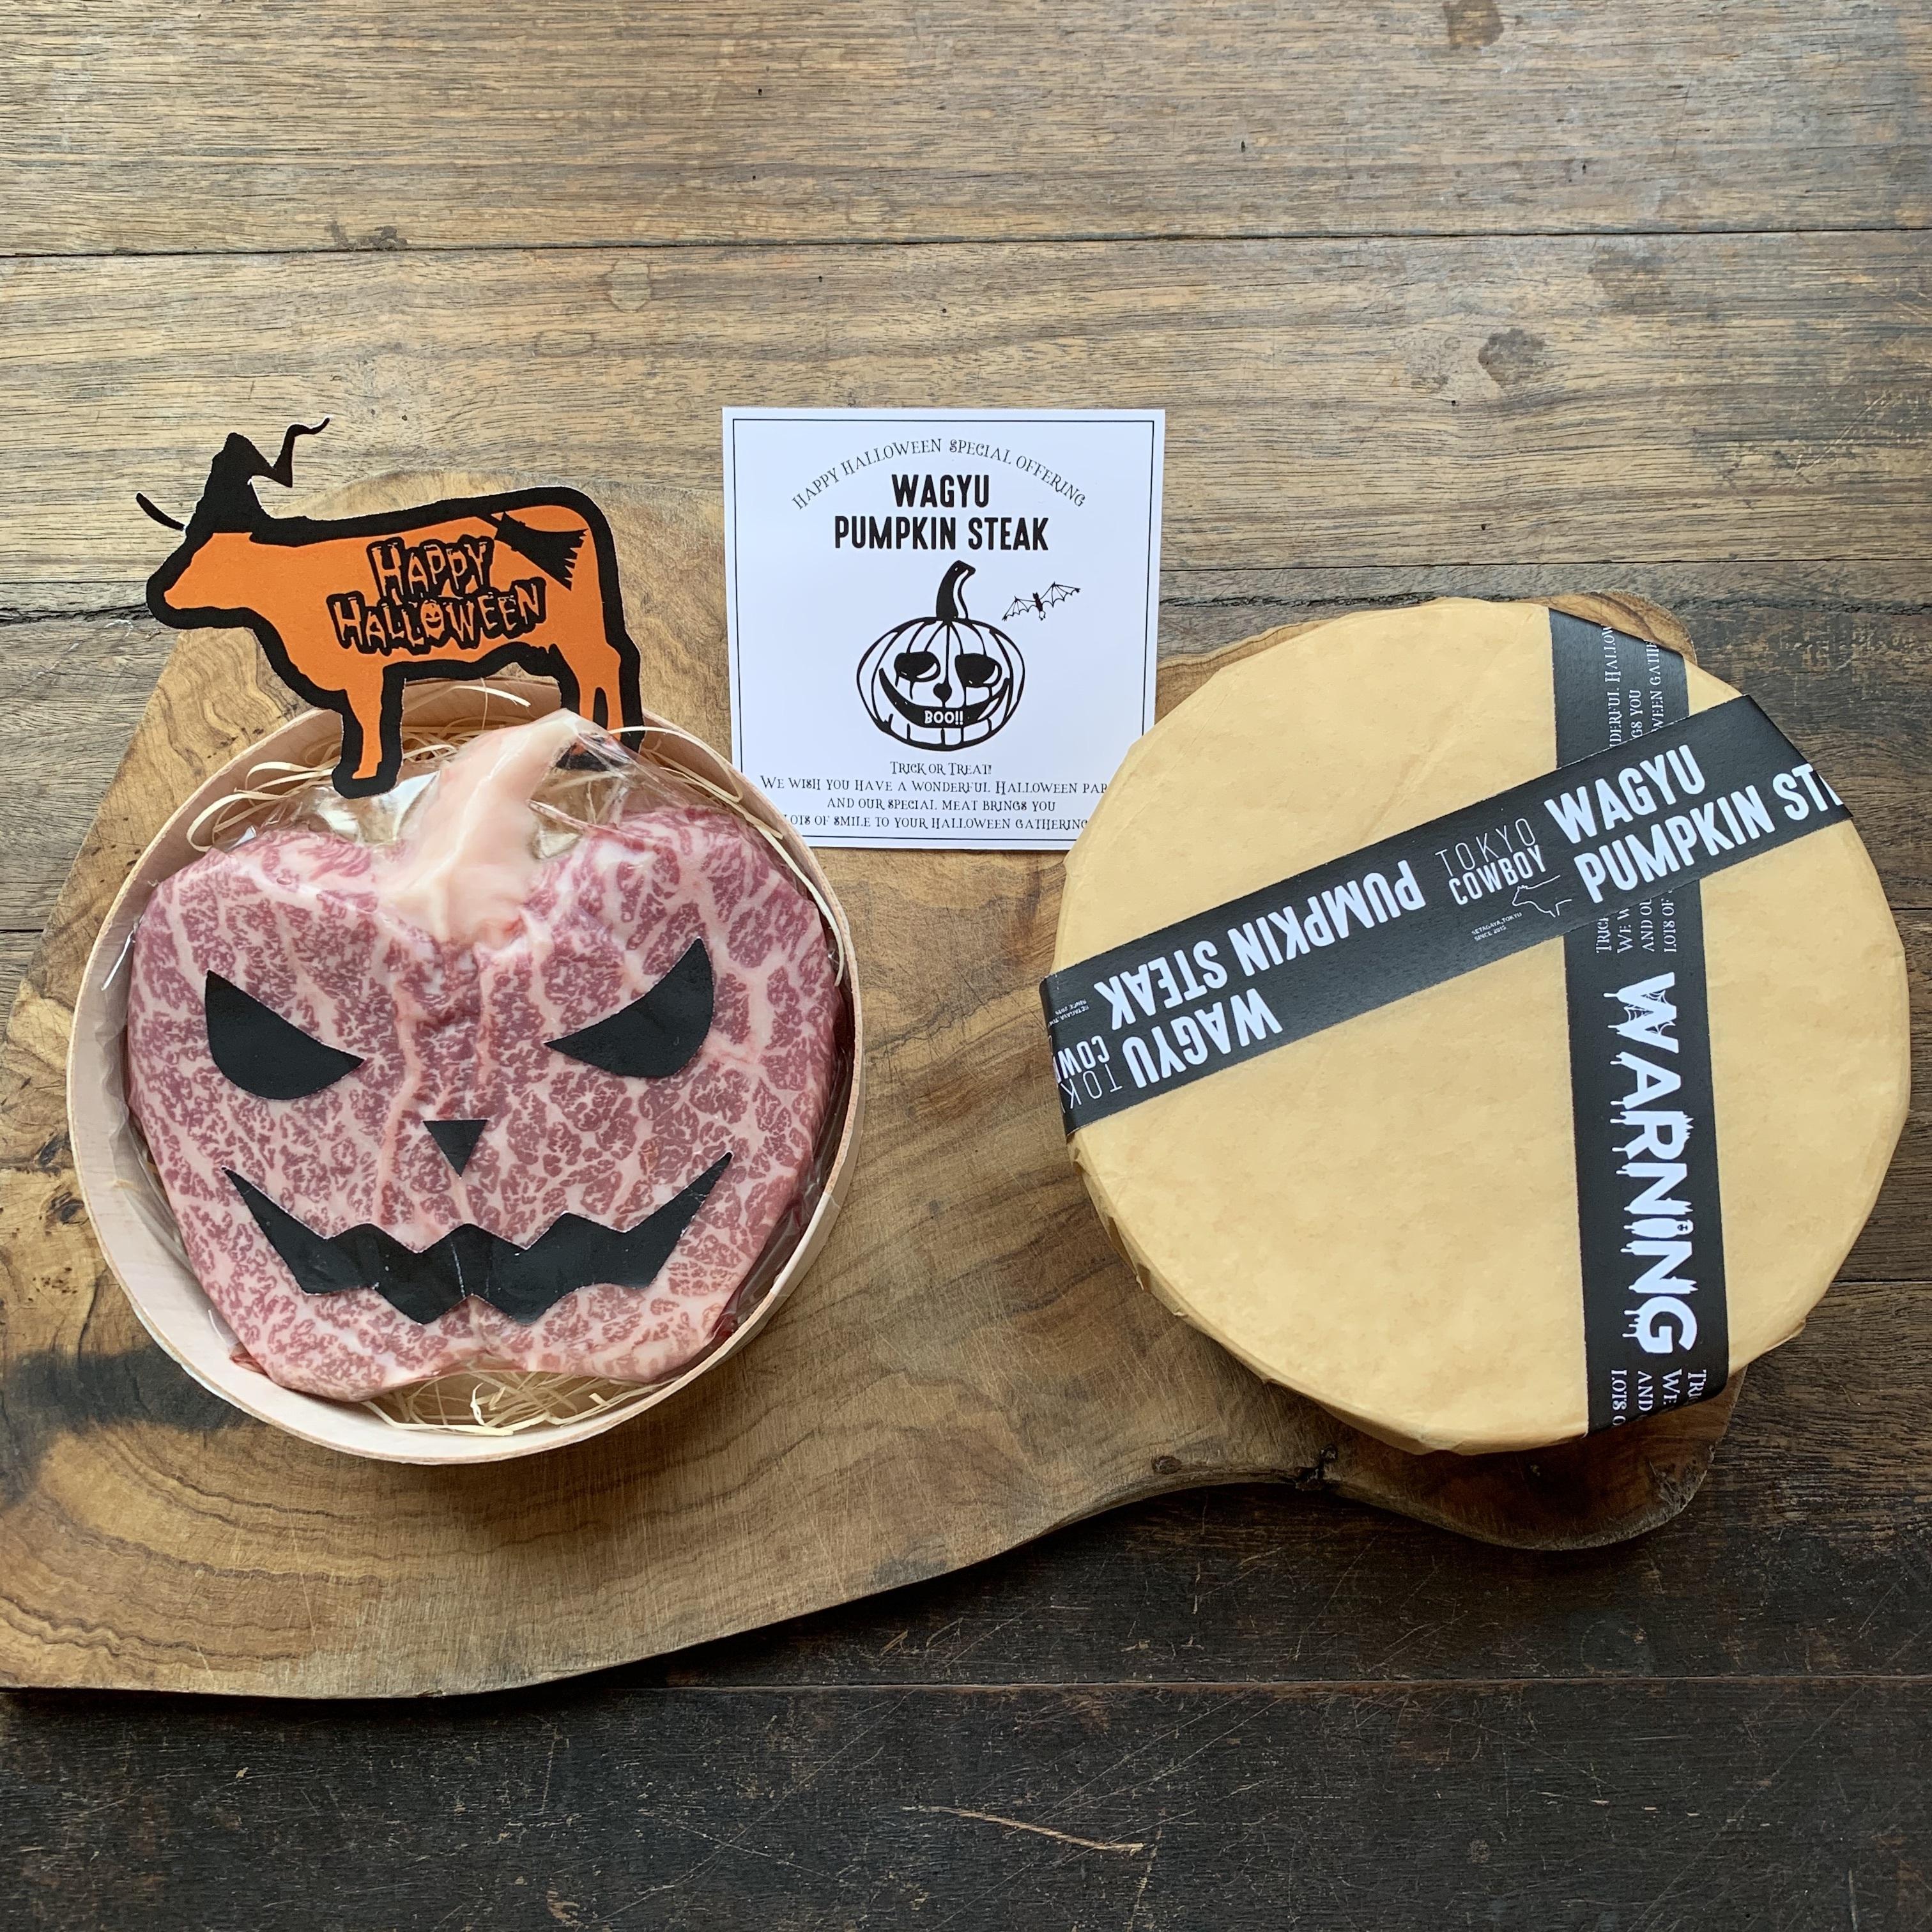 Halloween限定Pumpkin Steak(和牛ウチモモステーキ/200g相当)